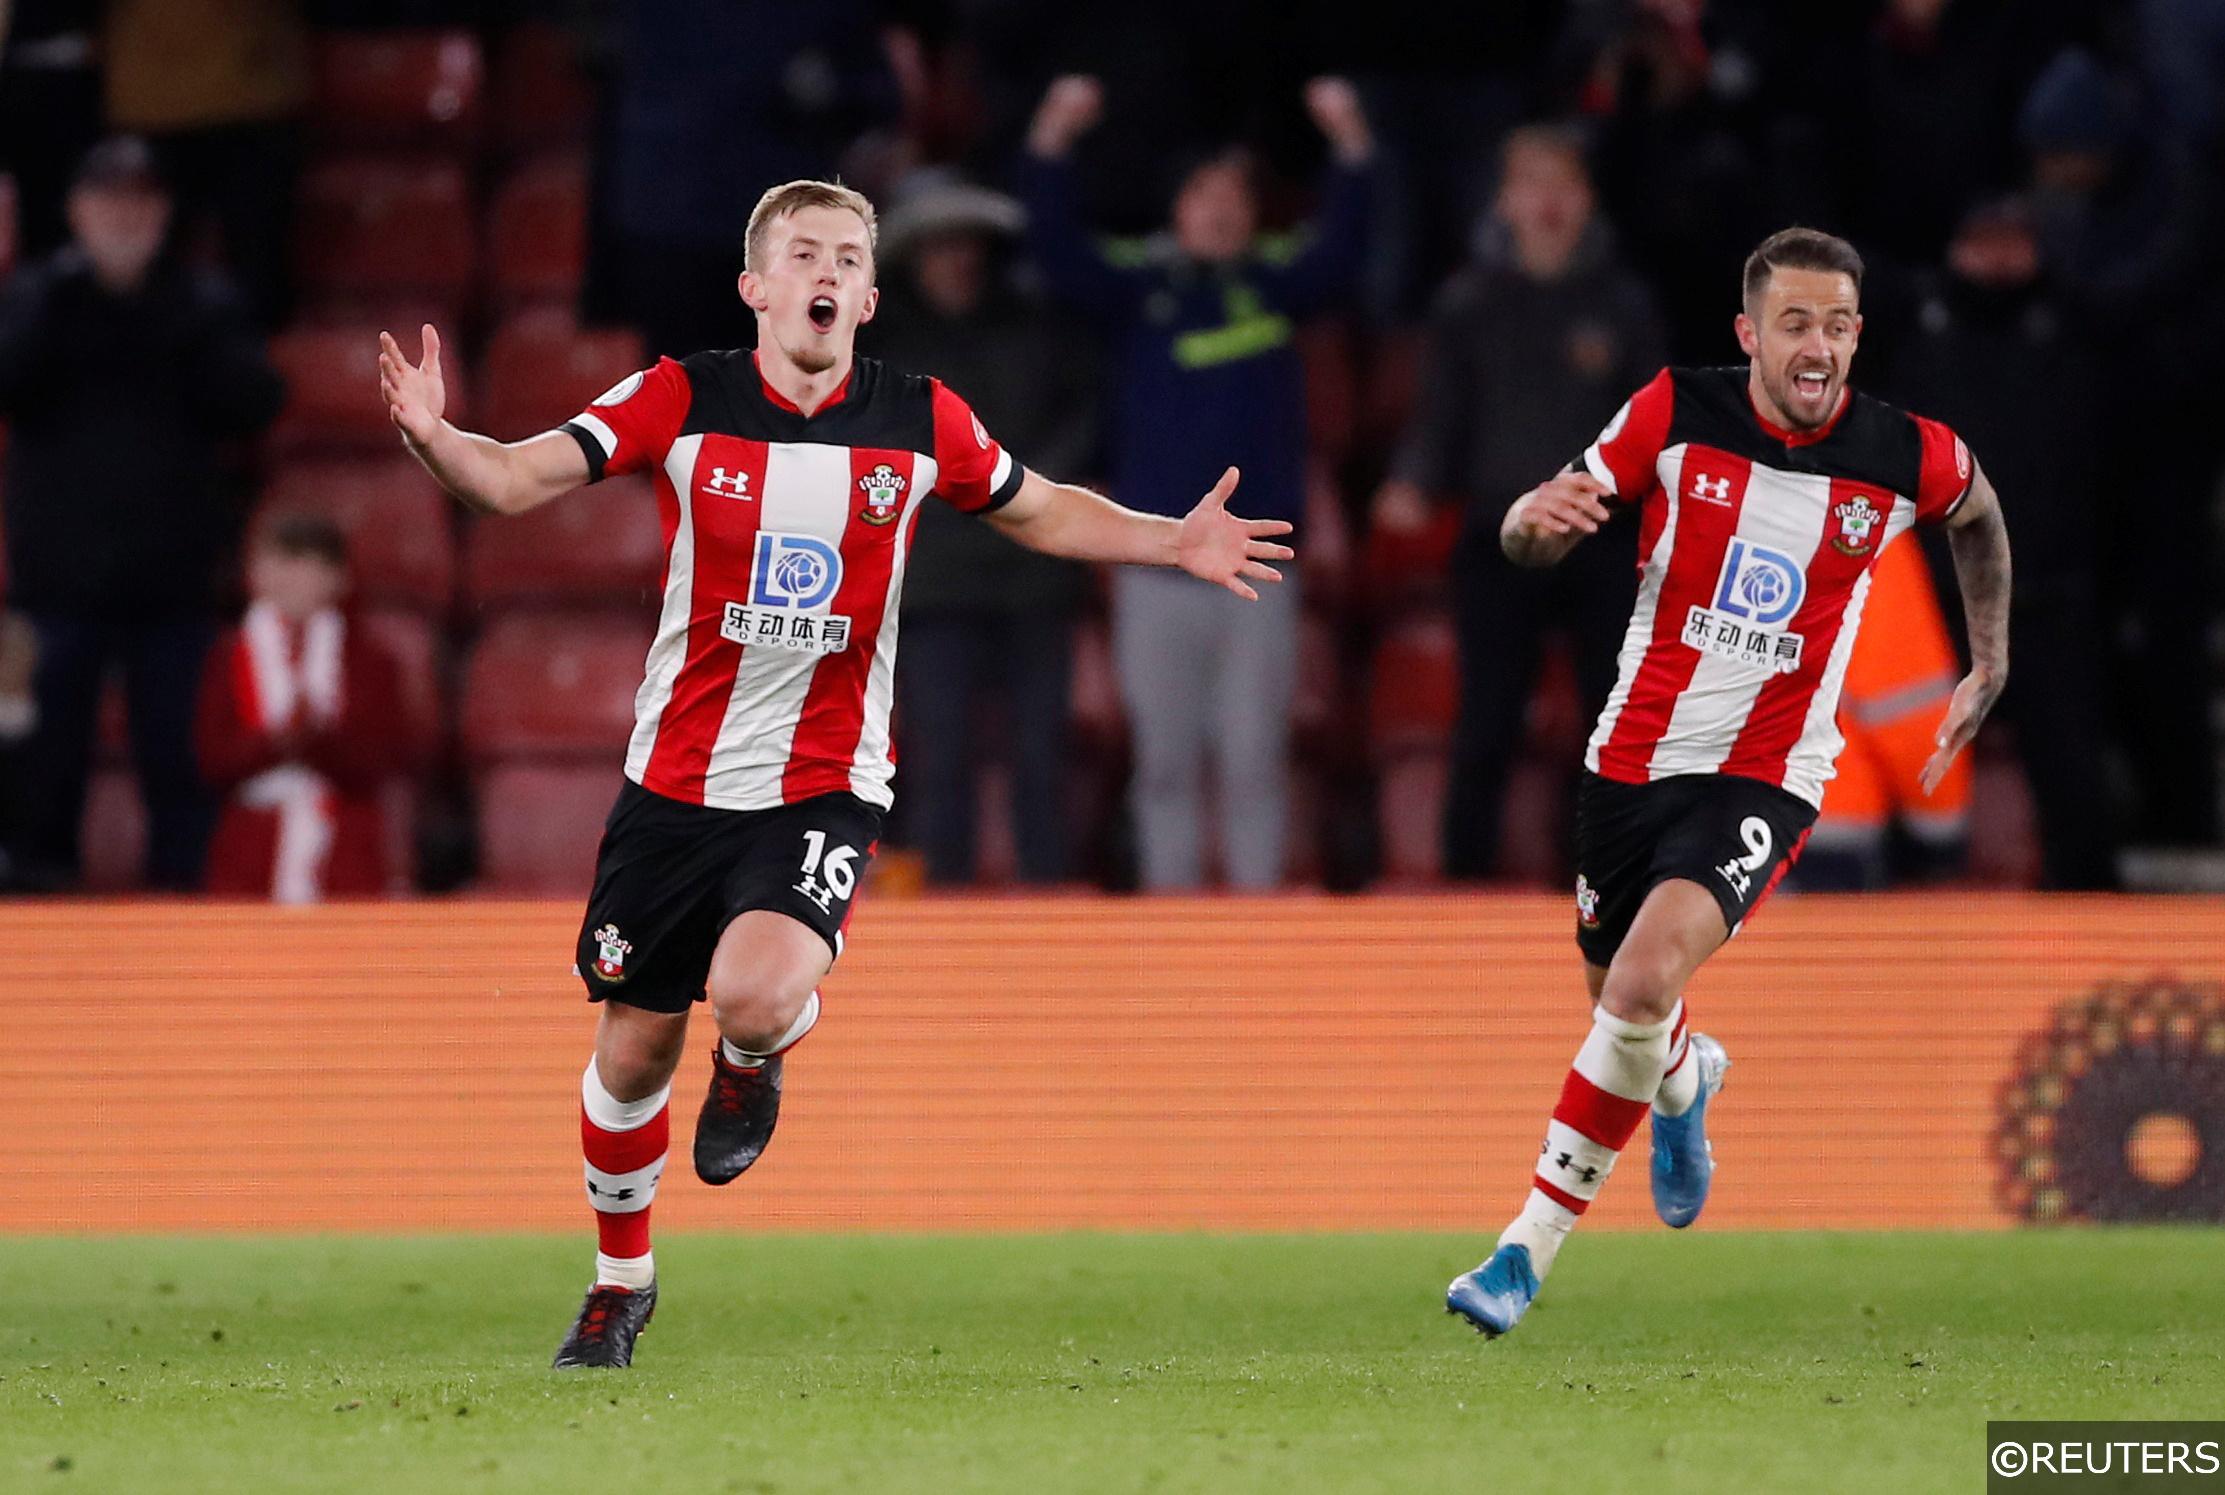 Southampton players celebrate after scoring a goal